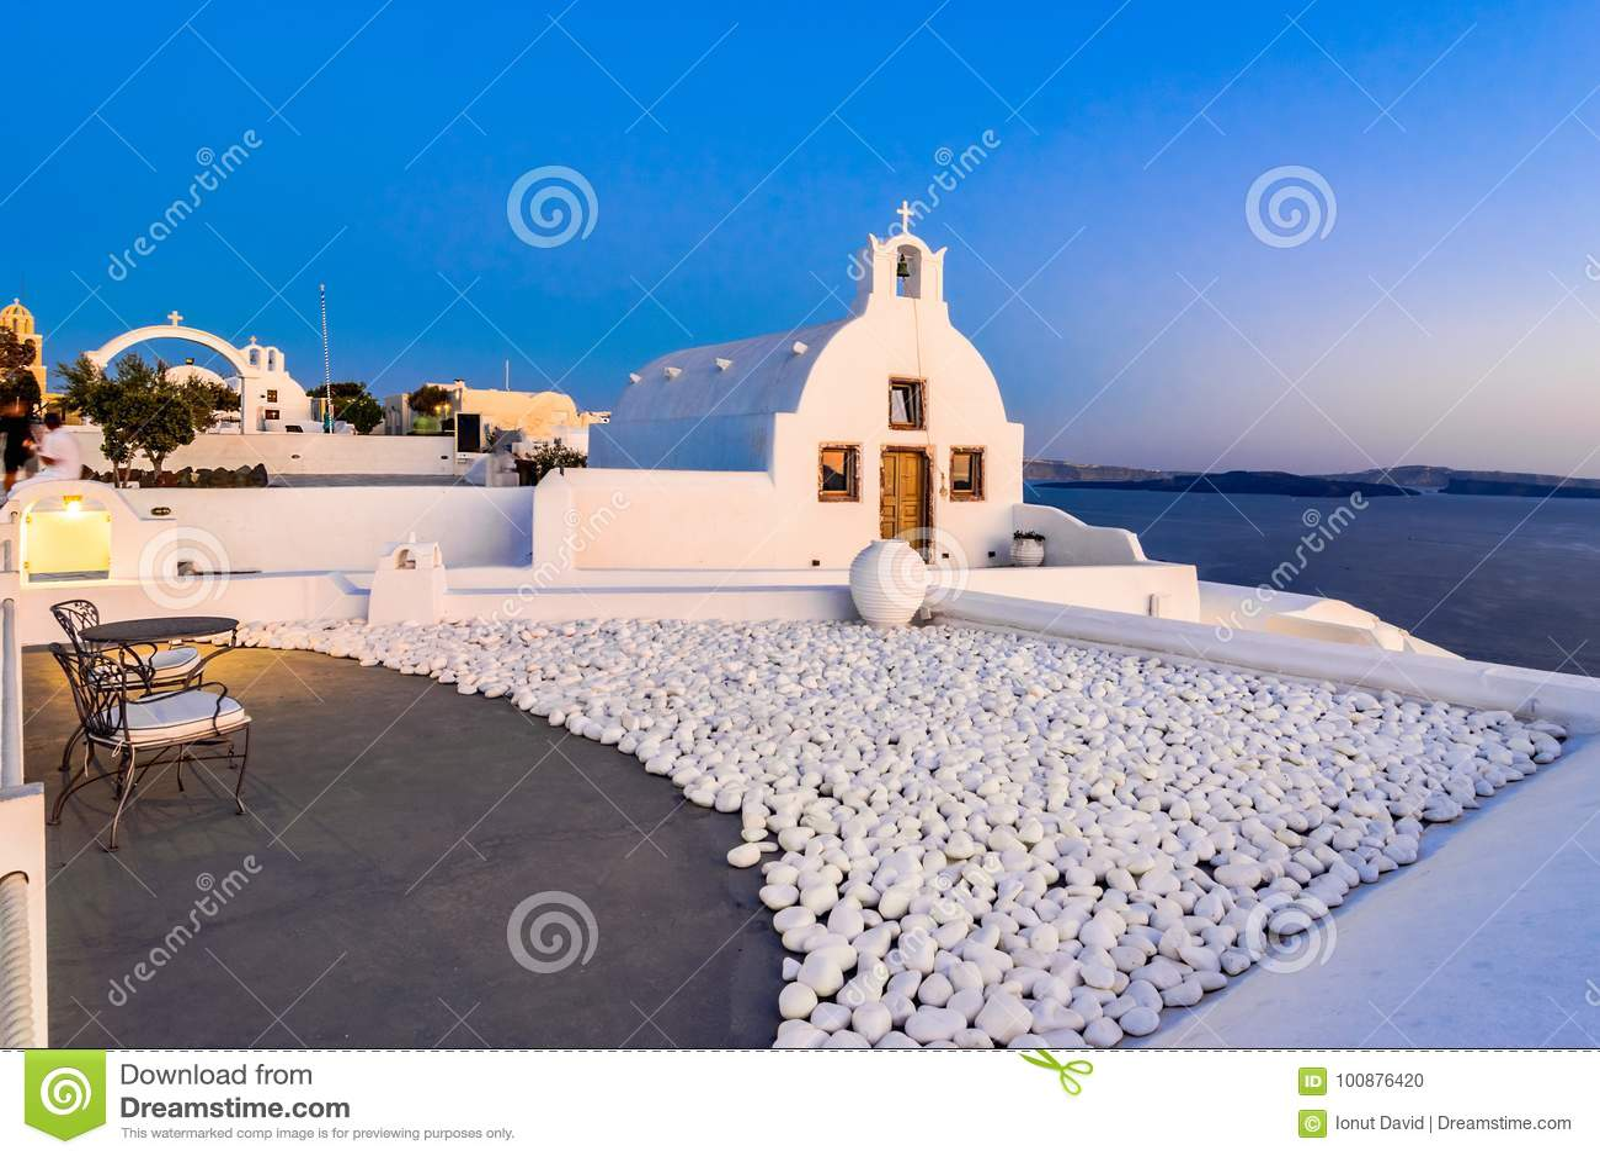 Oia stad, Santorini-eiland, Griekenland bij zonsondergang Traditioneel en FA